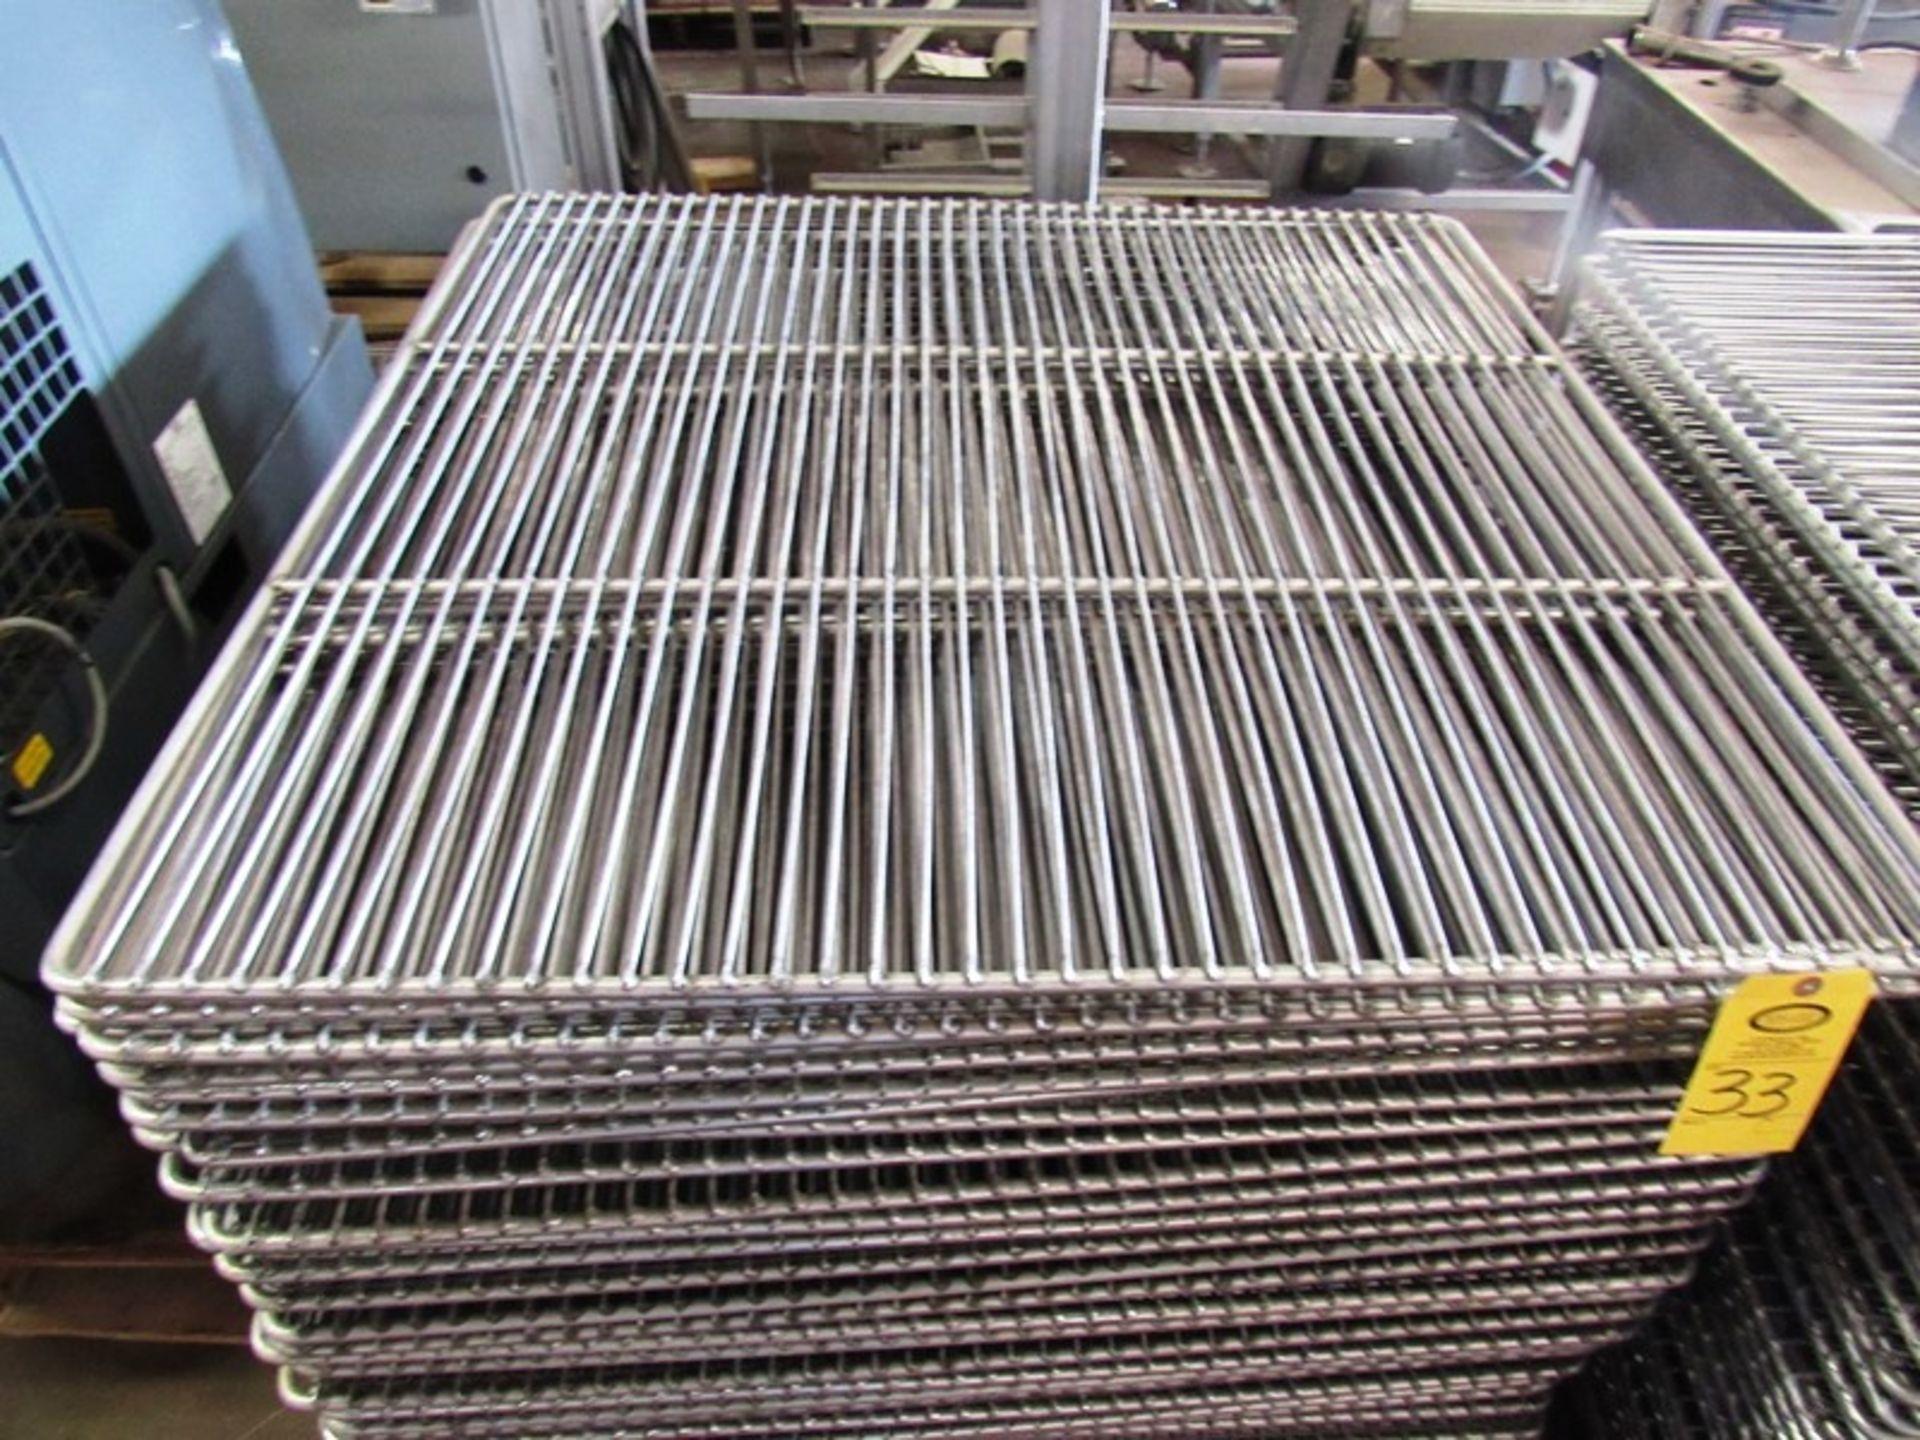 "Lot 33 - Stainless Steel Smoke Screens, 41 1/2"" W X 41 1/2"" L"